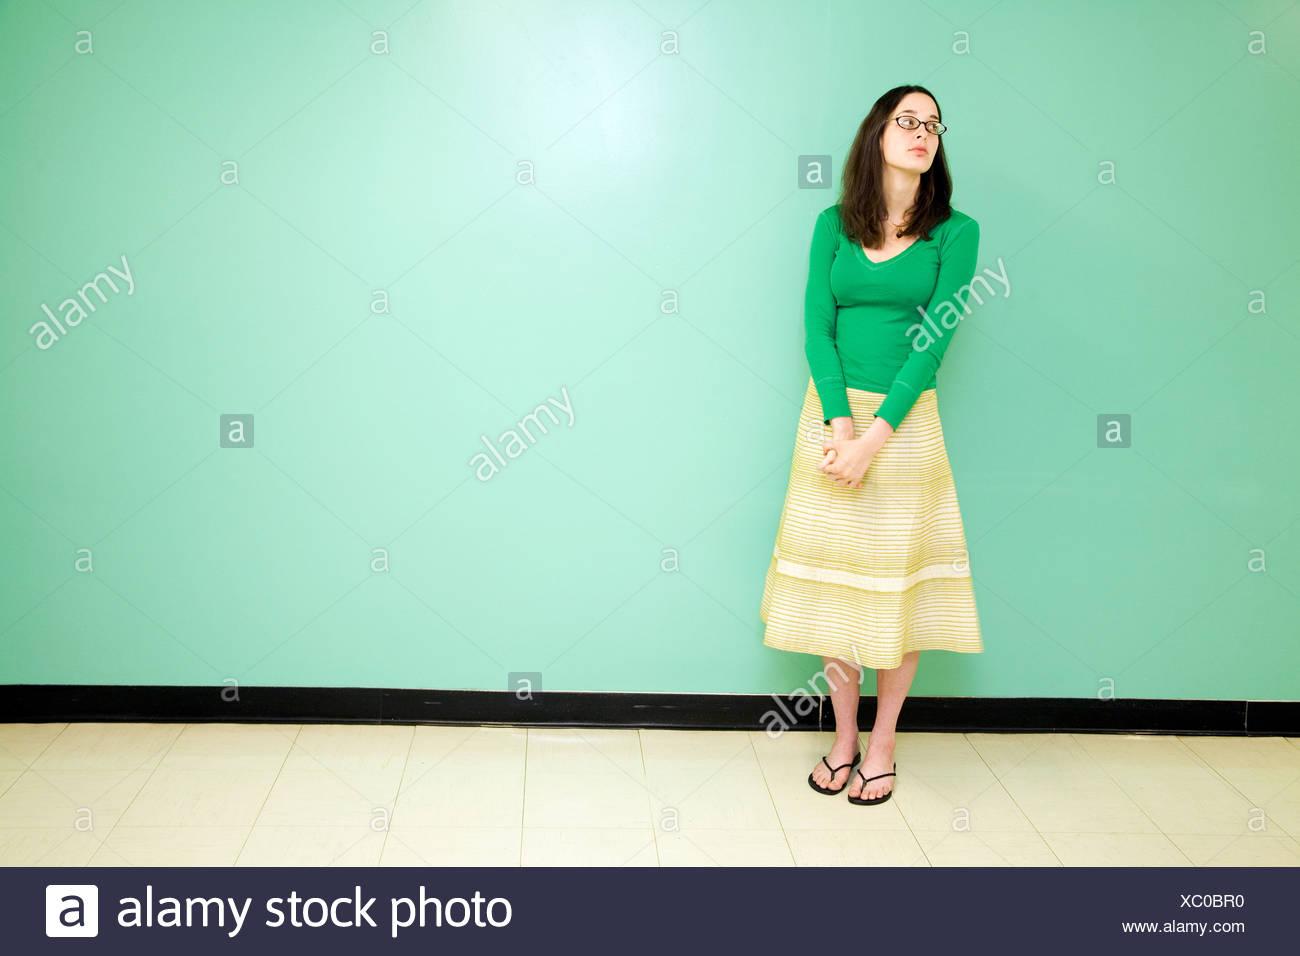 Mujer joven contra una pared verde Imagen De Stock